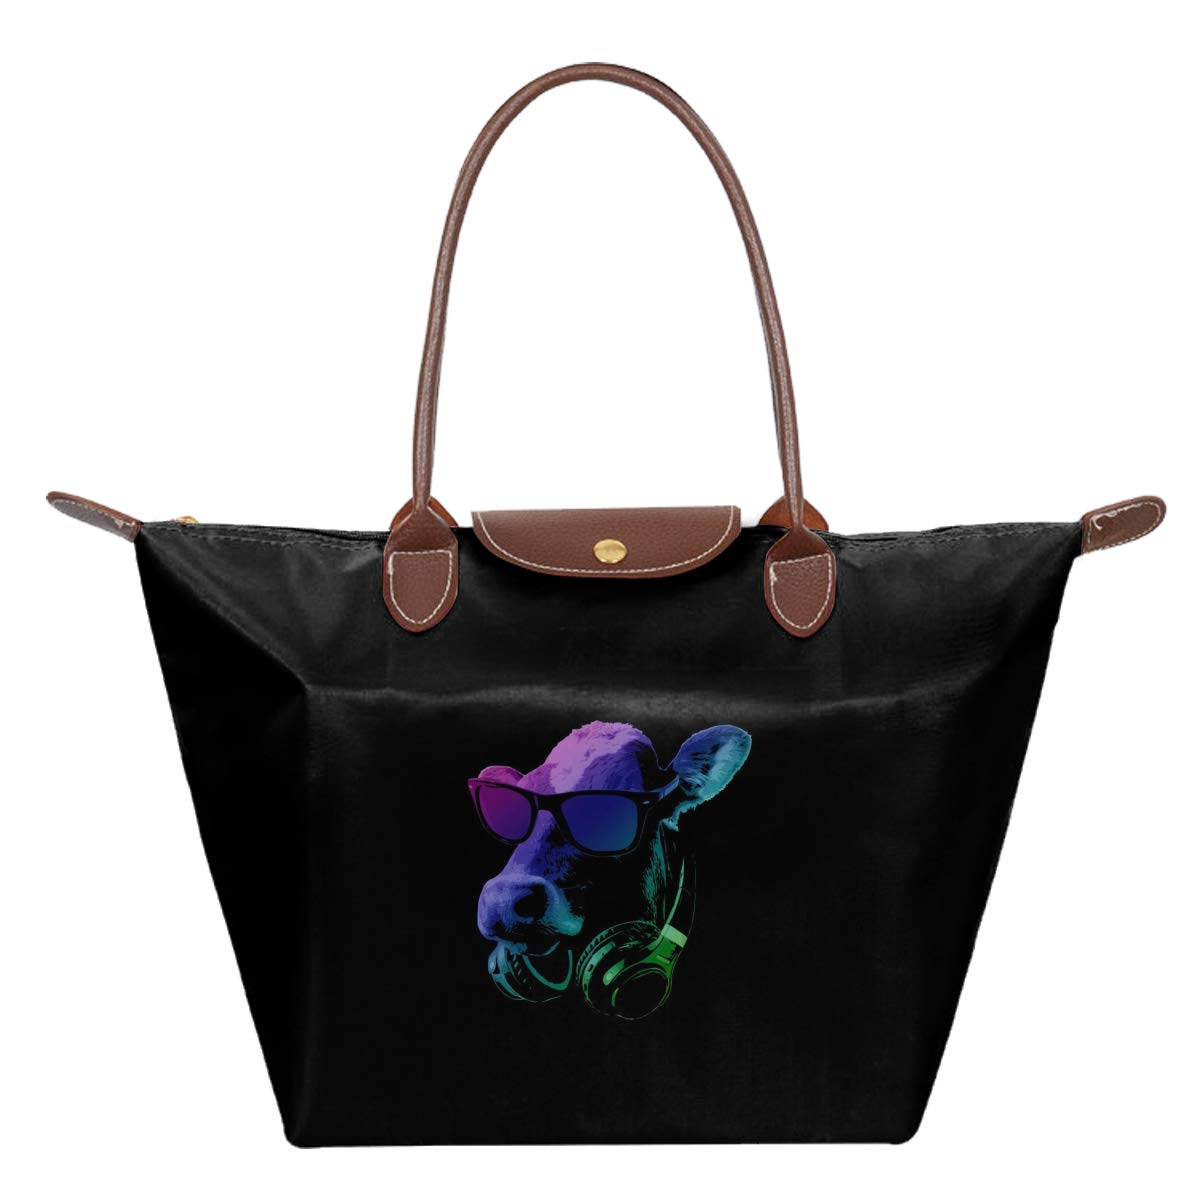 DJ Cow Waterproof Leather Folded Messenger Nylon Bag Travel Tote Hopping Folding School Handbags